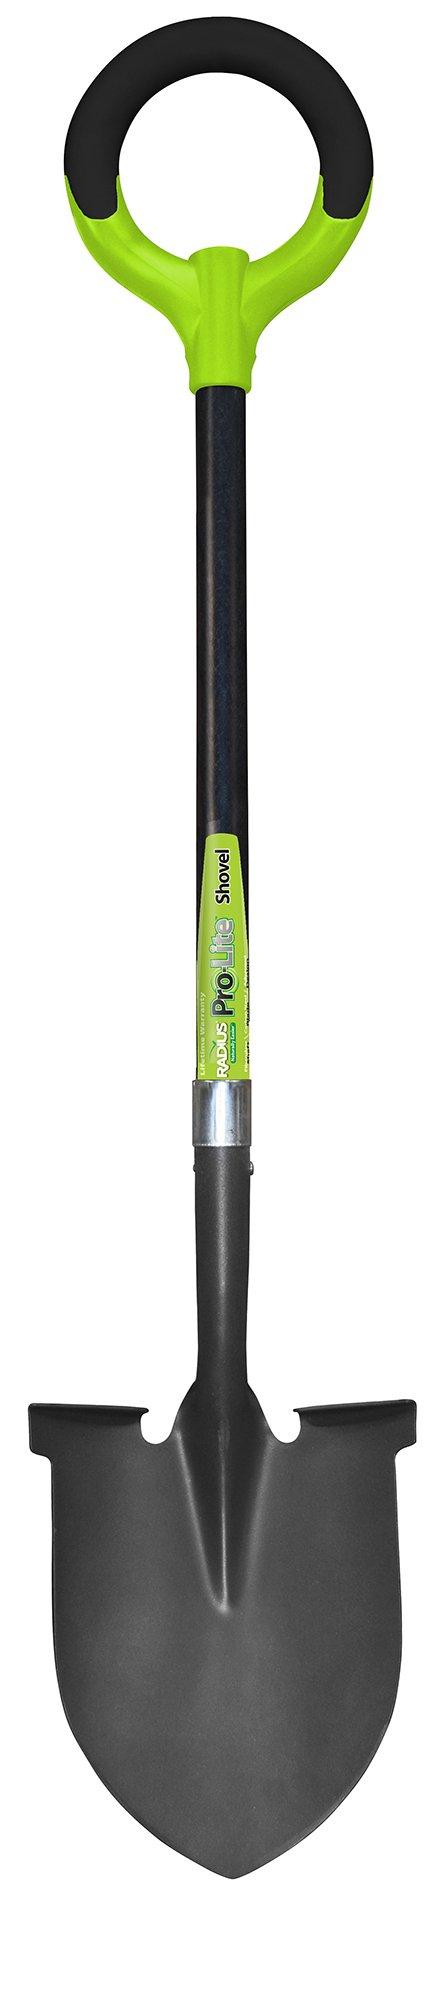 Radius Garden 25202 Pro-Lite Ergonomic Carbon Steel Shovel, Green by Radius Garden